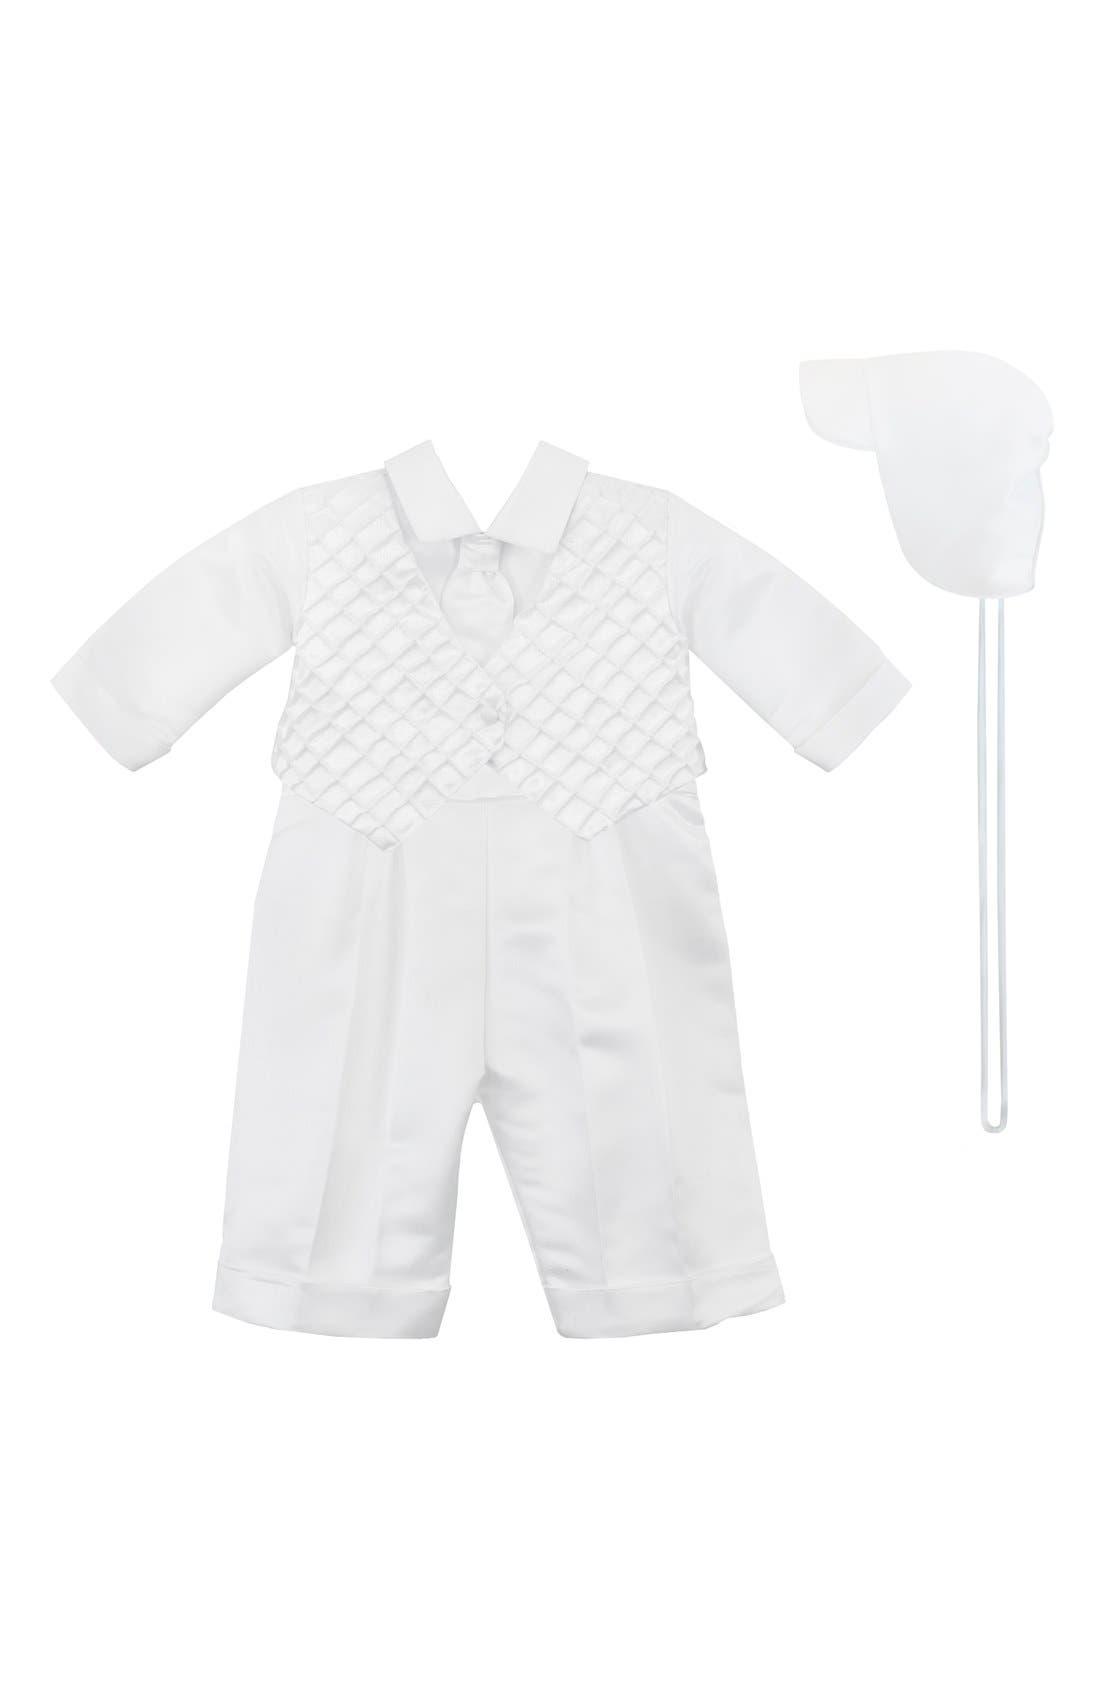 C.I. CASTRO & CO. Christening Shirt, Pants & Hat, Main, color, WHITE